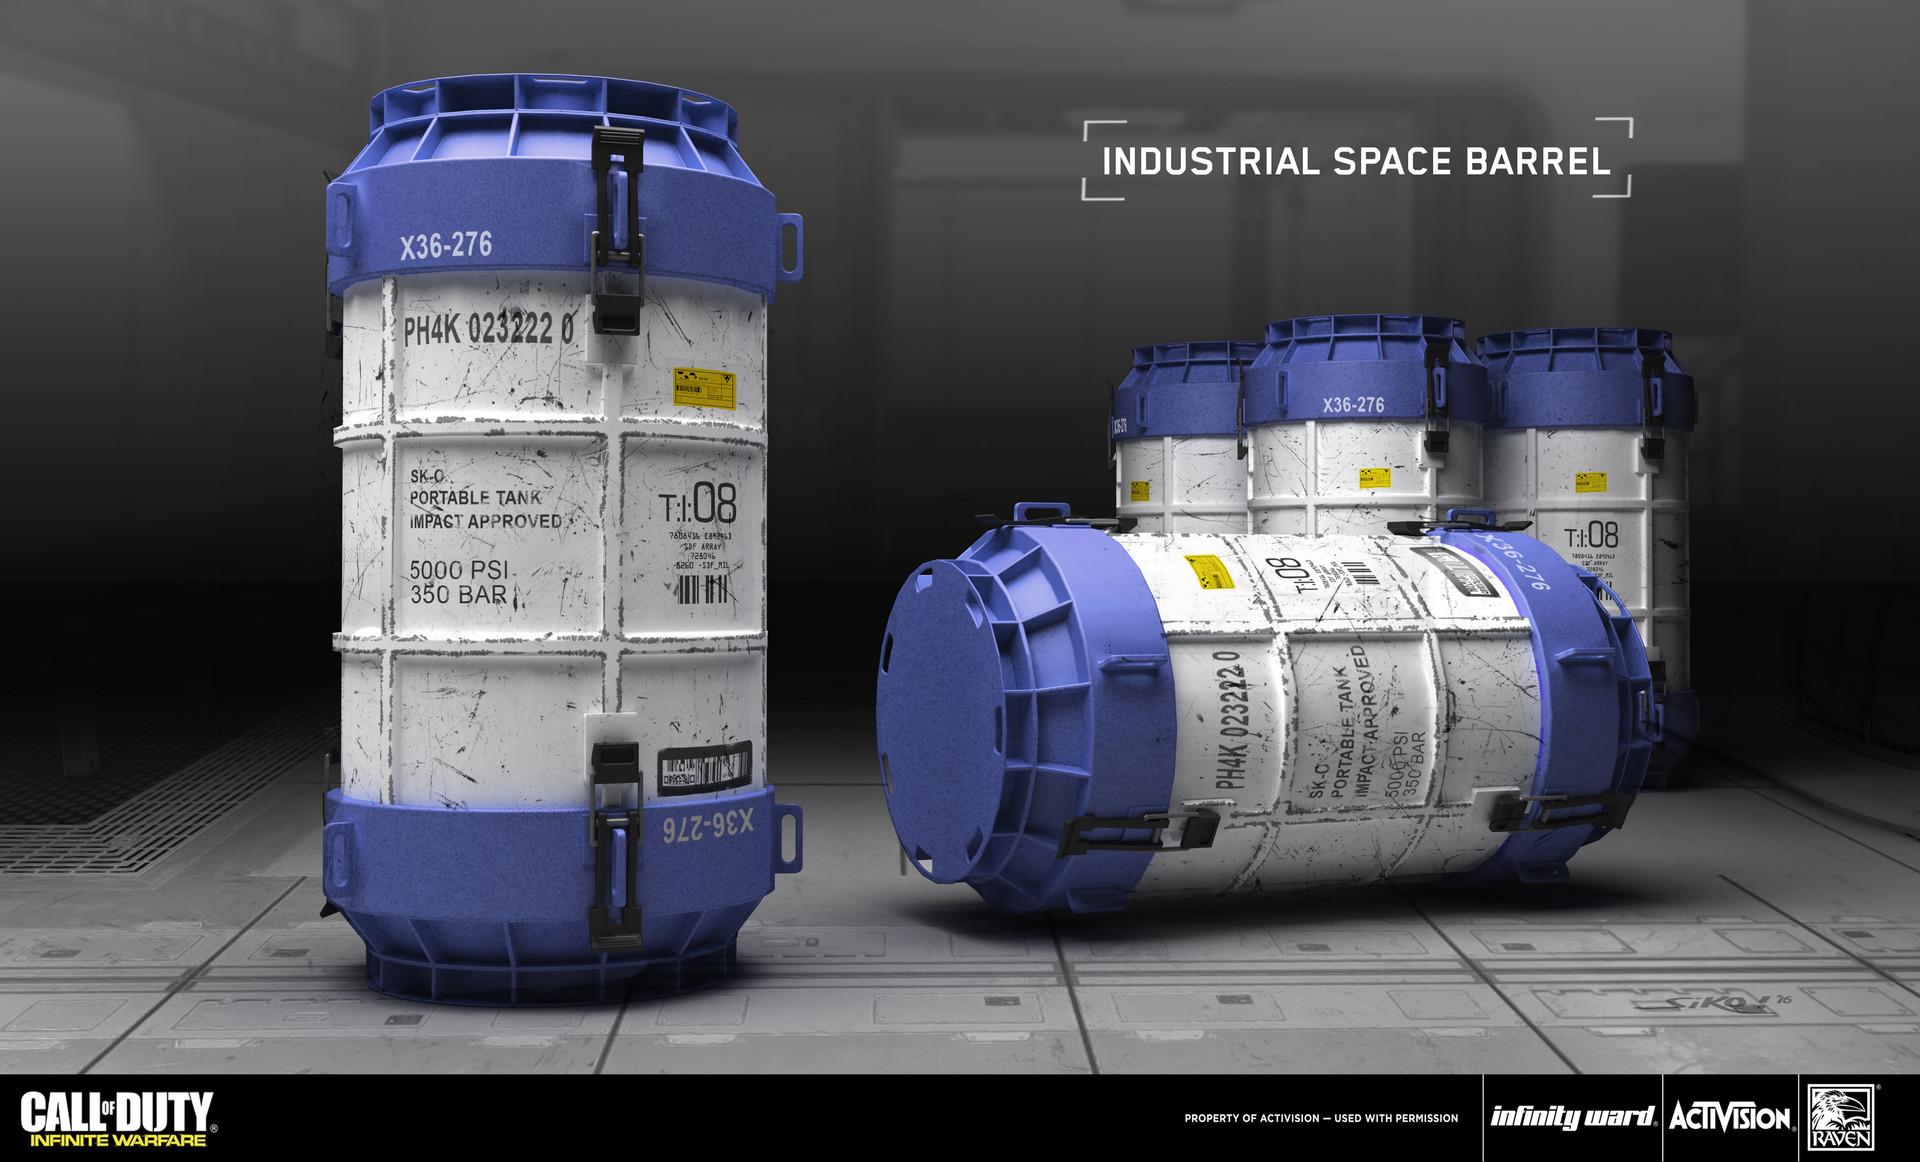 Simon ko prop sko iw7 03 17 16 industrial space barrel blue2